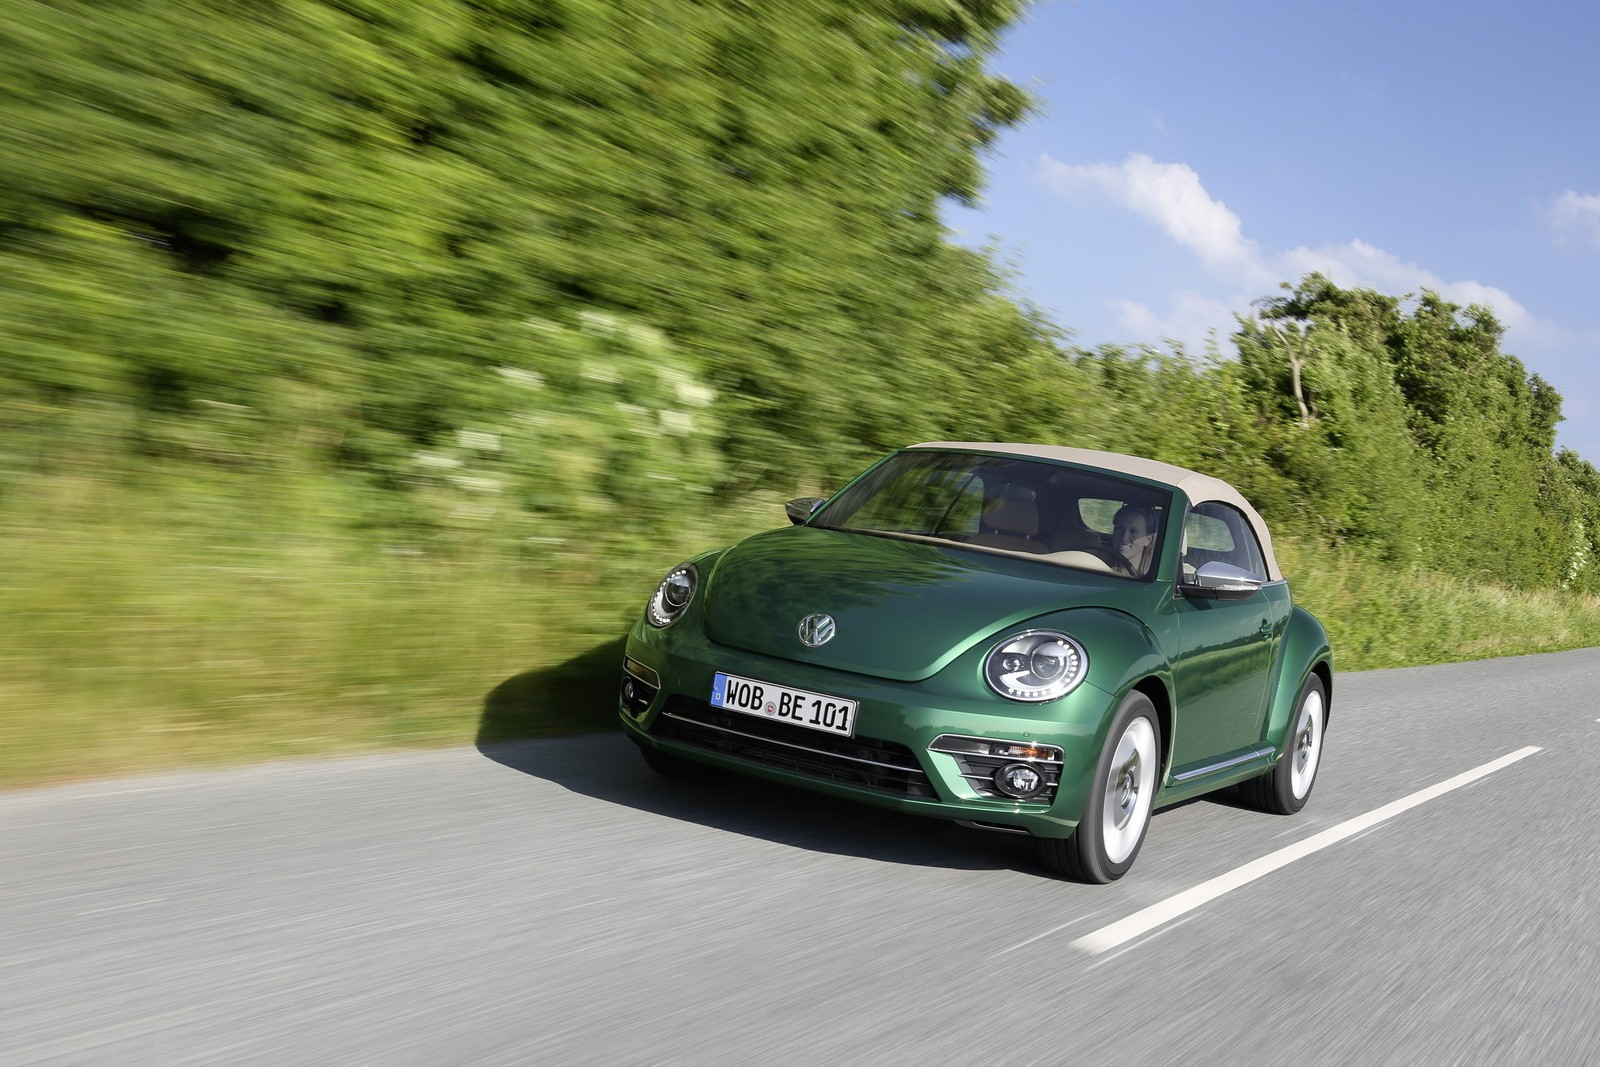 VW Beetle Dune Concept ing to Detroit autoevolution